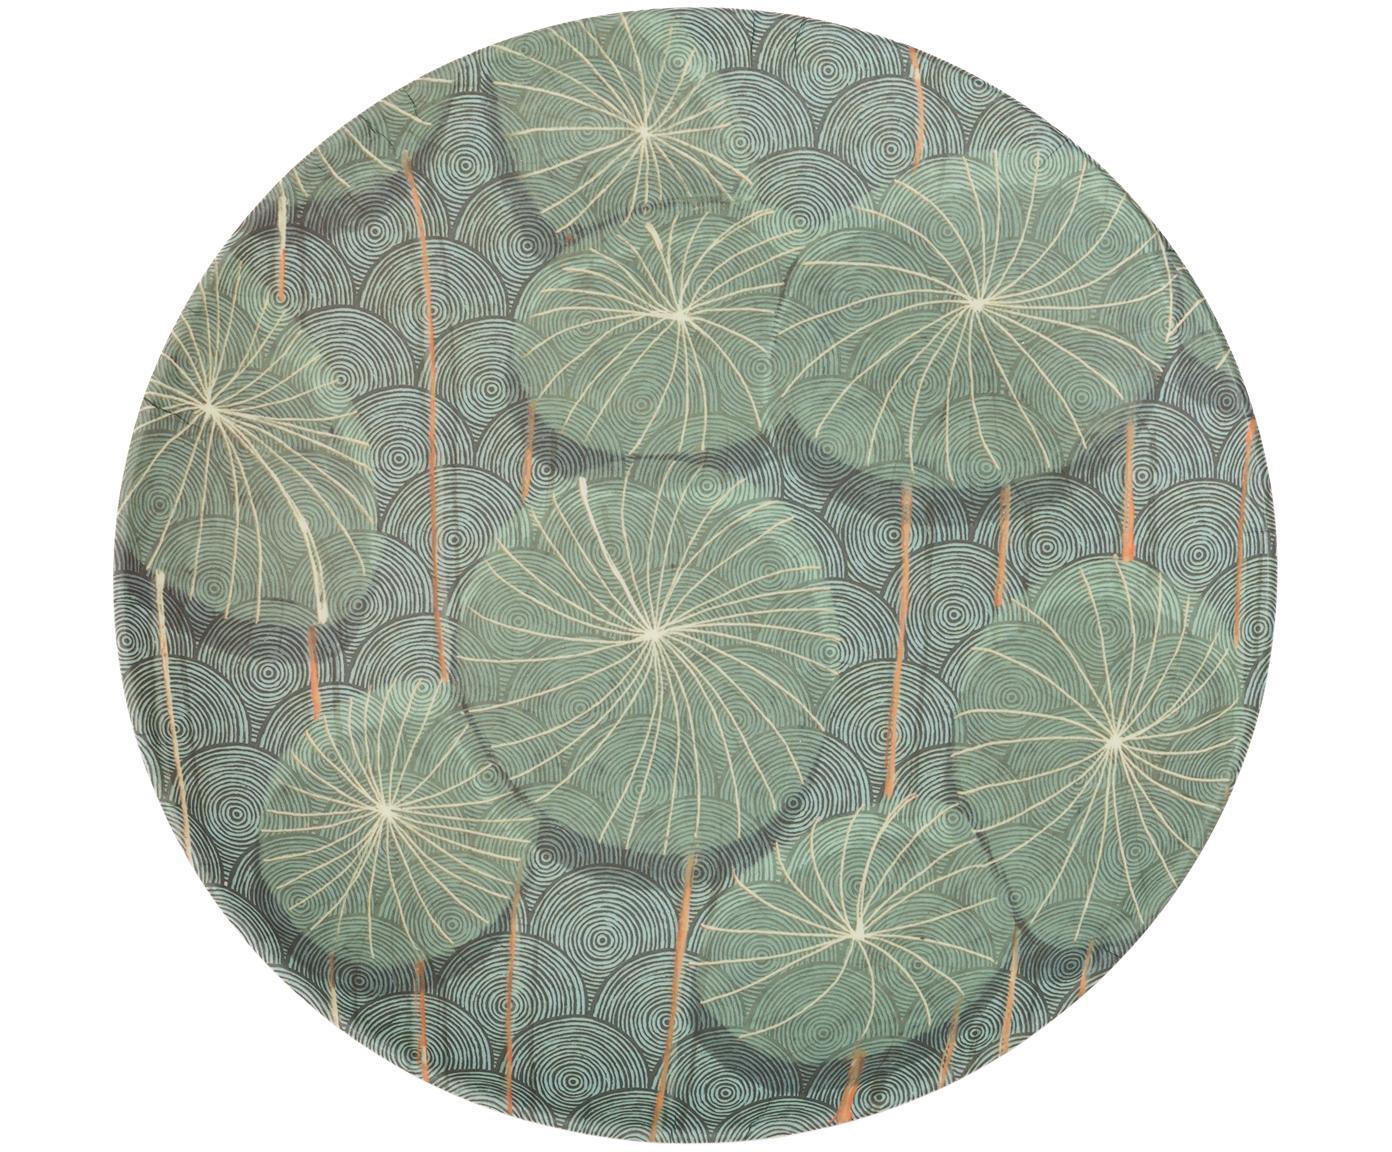 Bamboehouten ontbijtbord Nymphaea, Gelakte bamboevezels, Blauw, groen, Ø 20 x H 2 cm